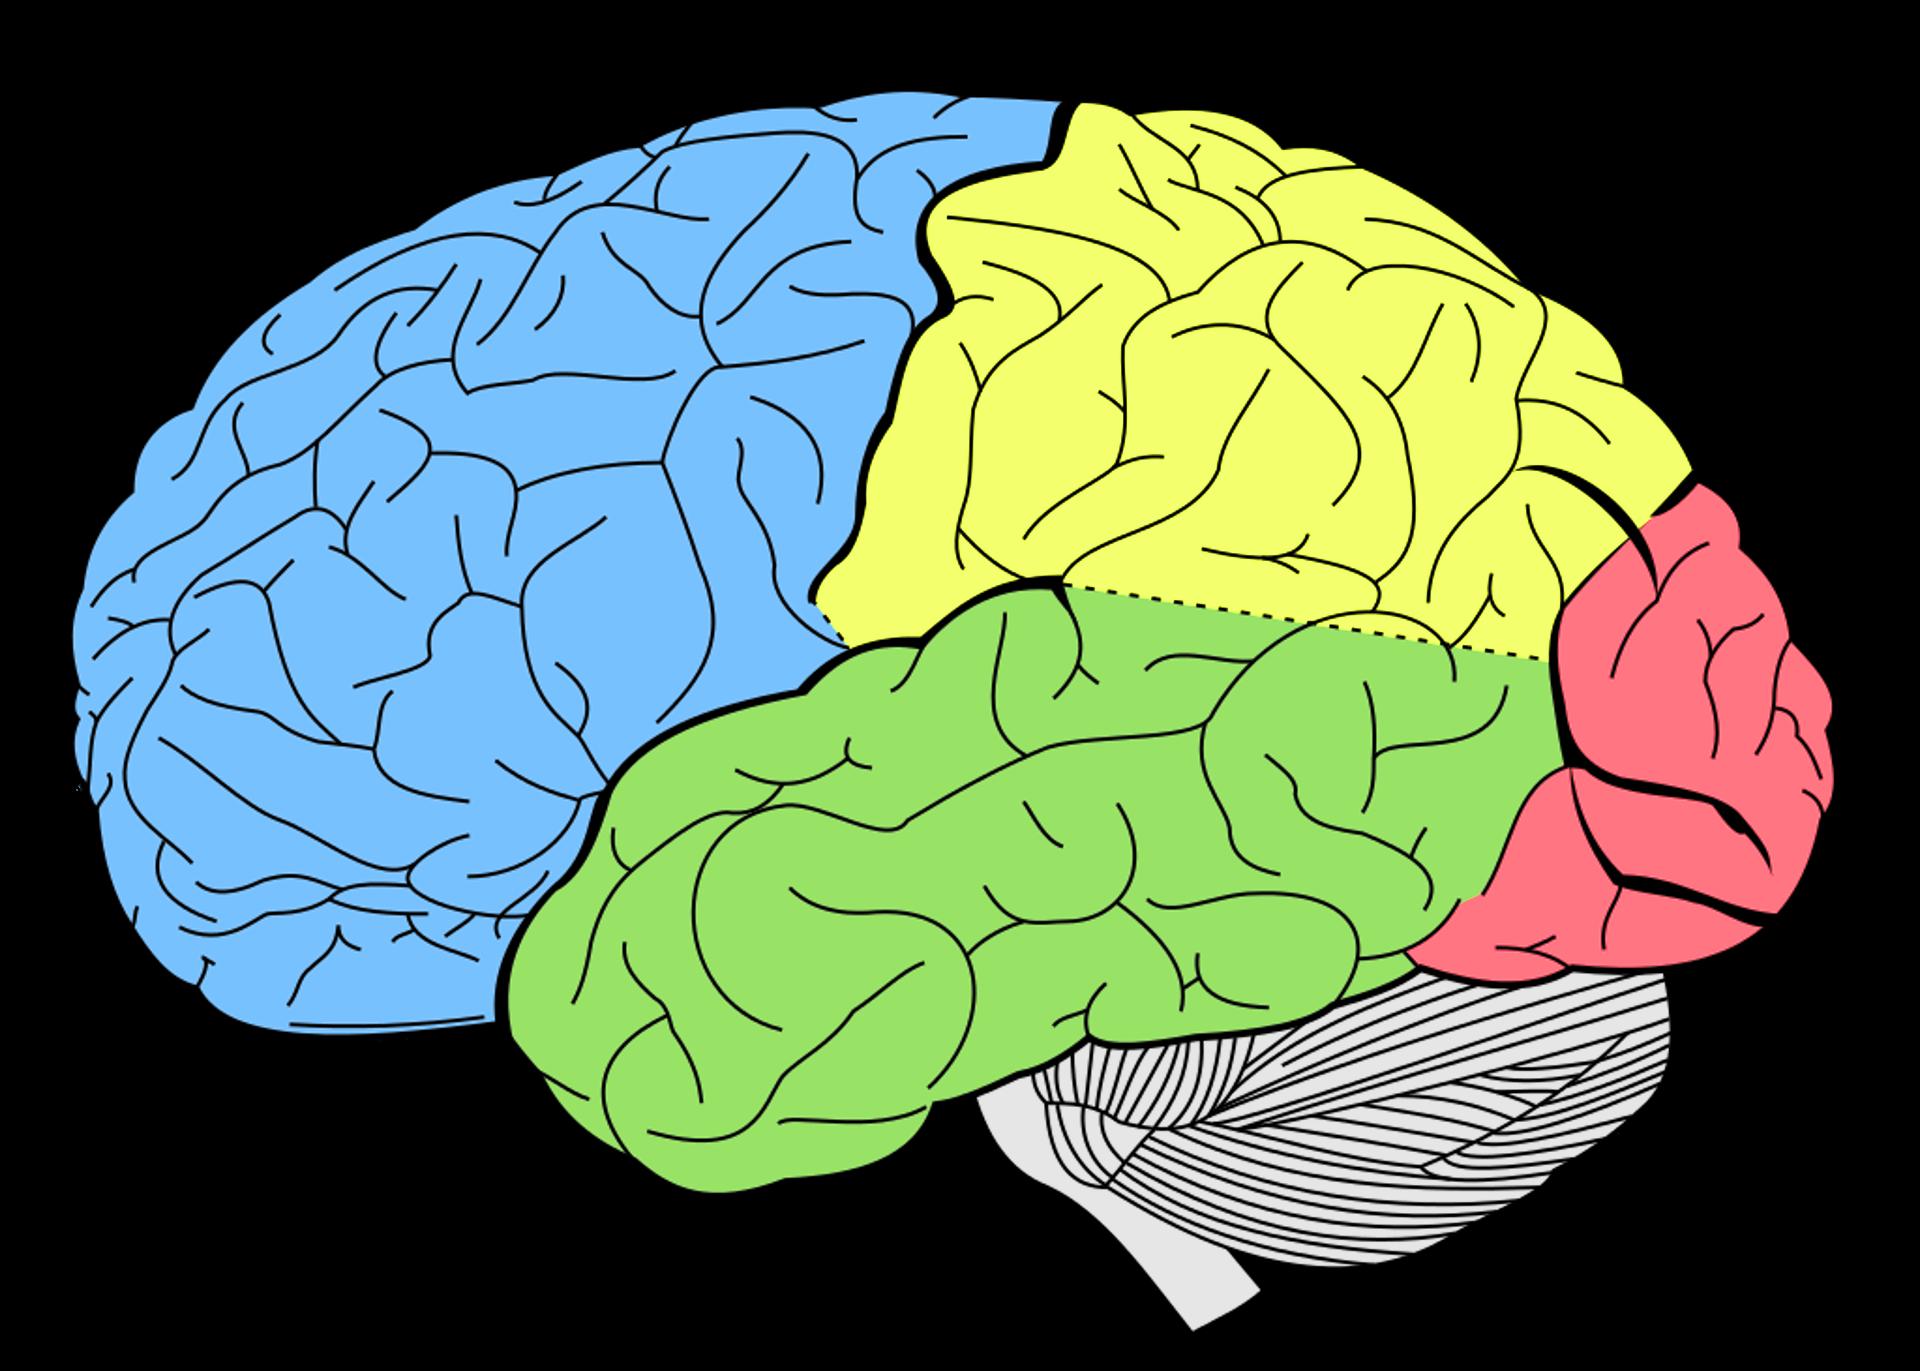 hvordan er hjernen opbygget